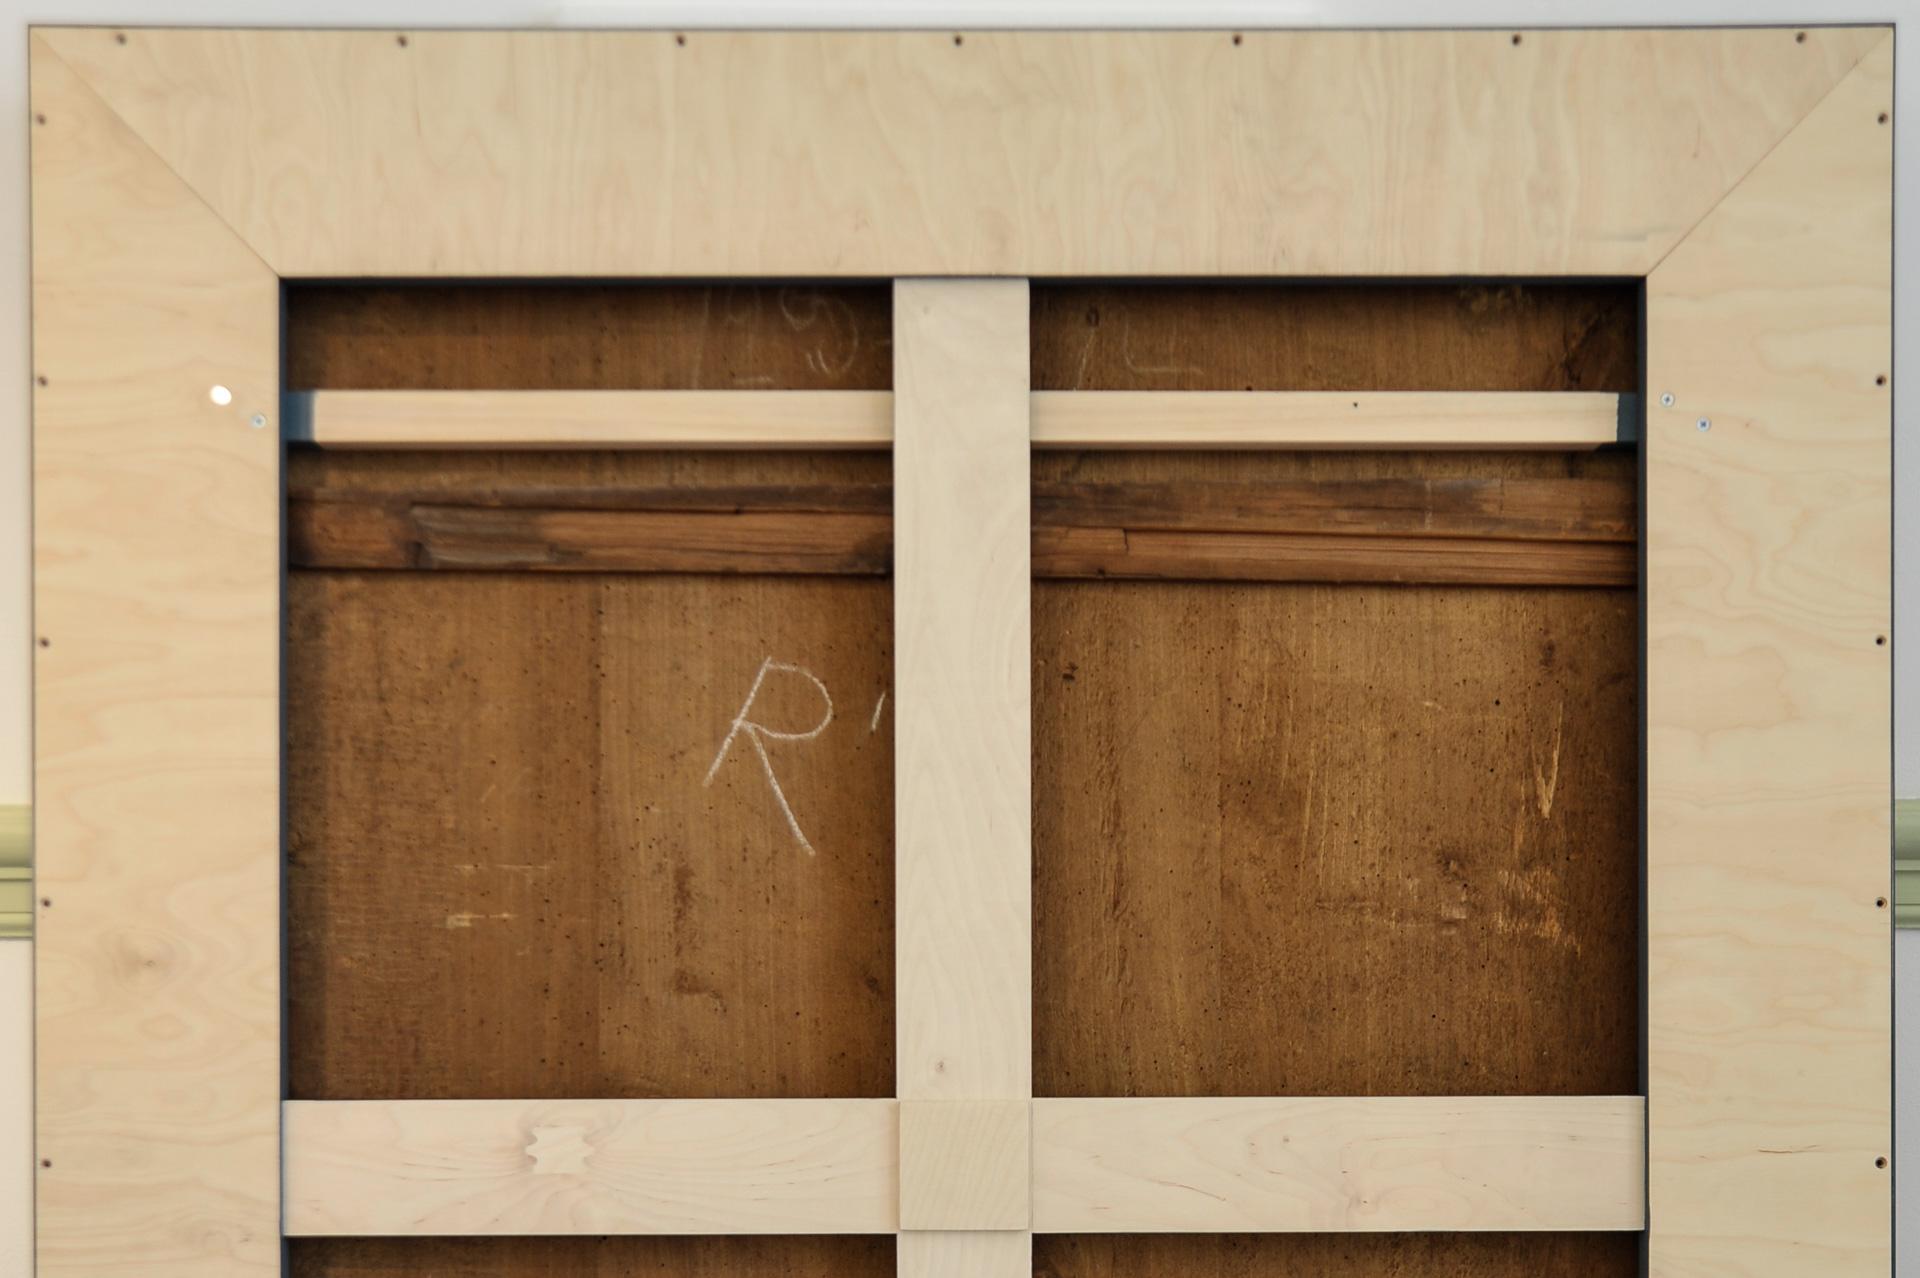 007-AtelierTournillon-Crucifixion-Bronzino